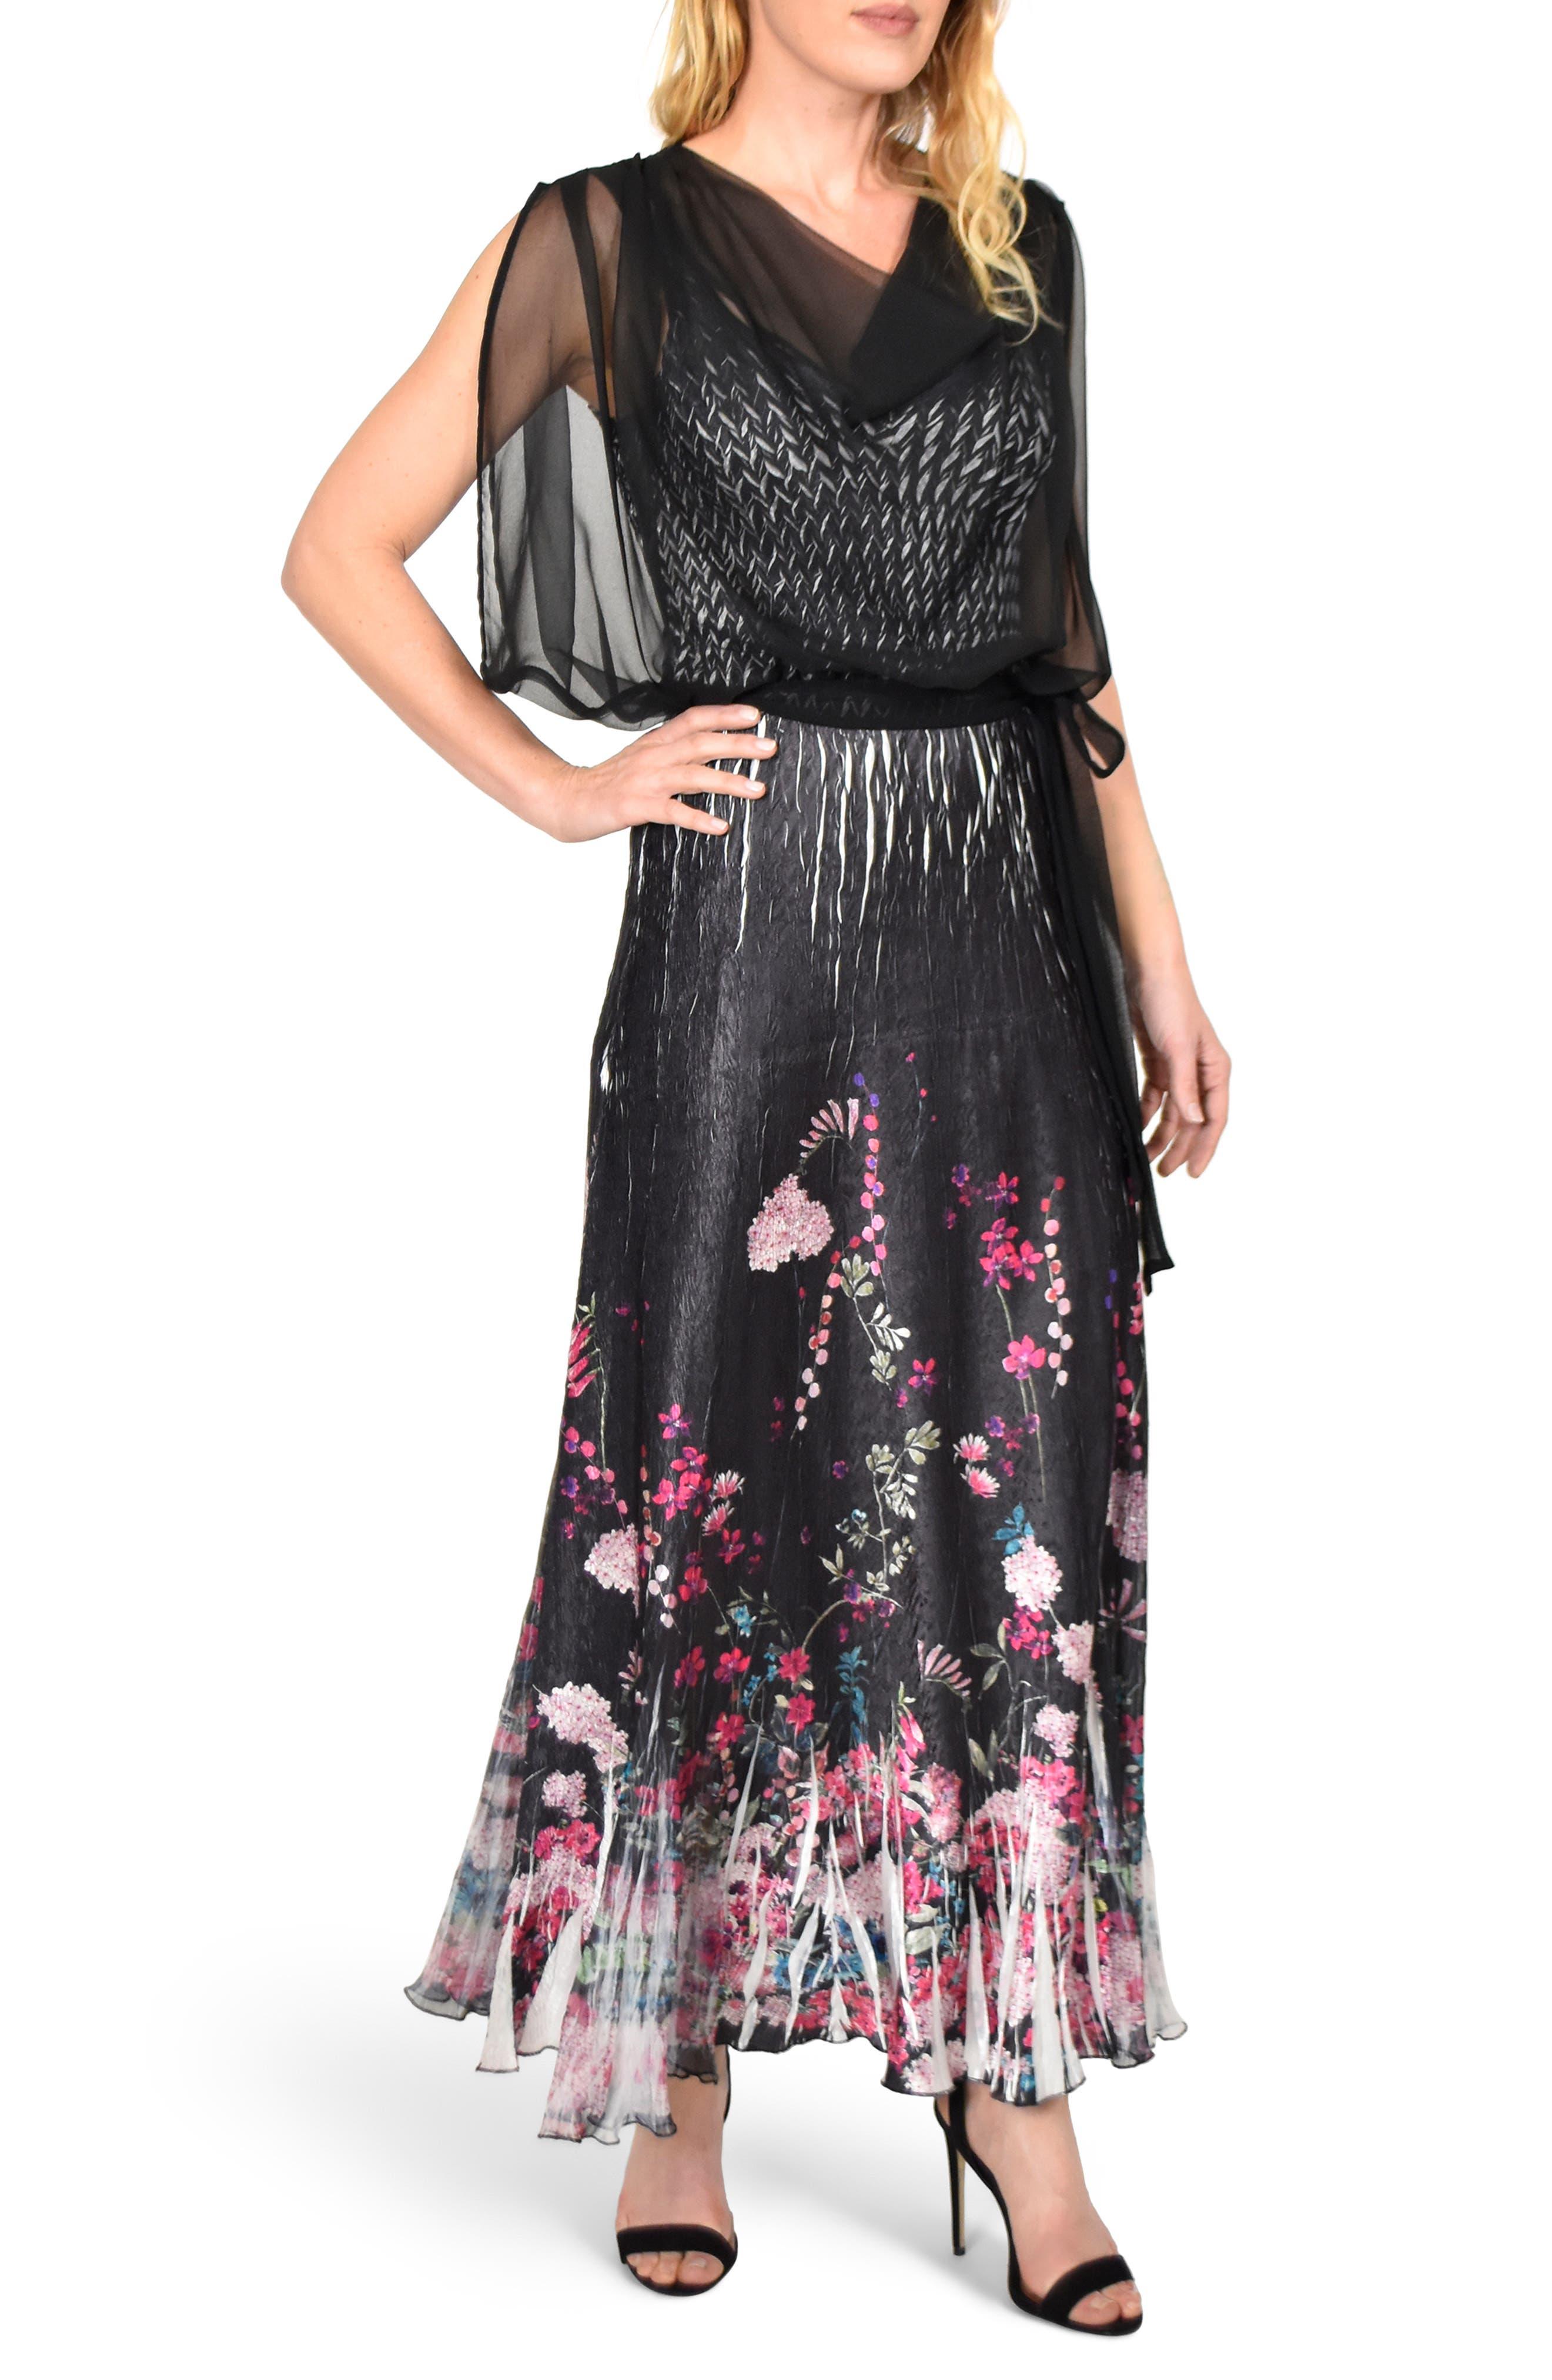 93a17a7ced5 komarov weddings   parties dresses for women - Buy best women s komarov  weddings   parties dresses on Cools.com Shop